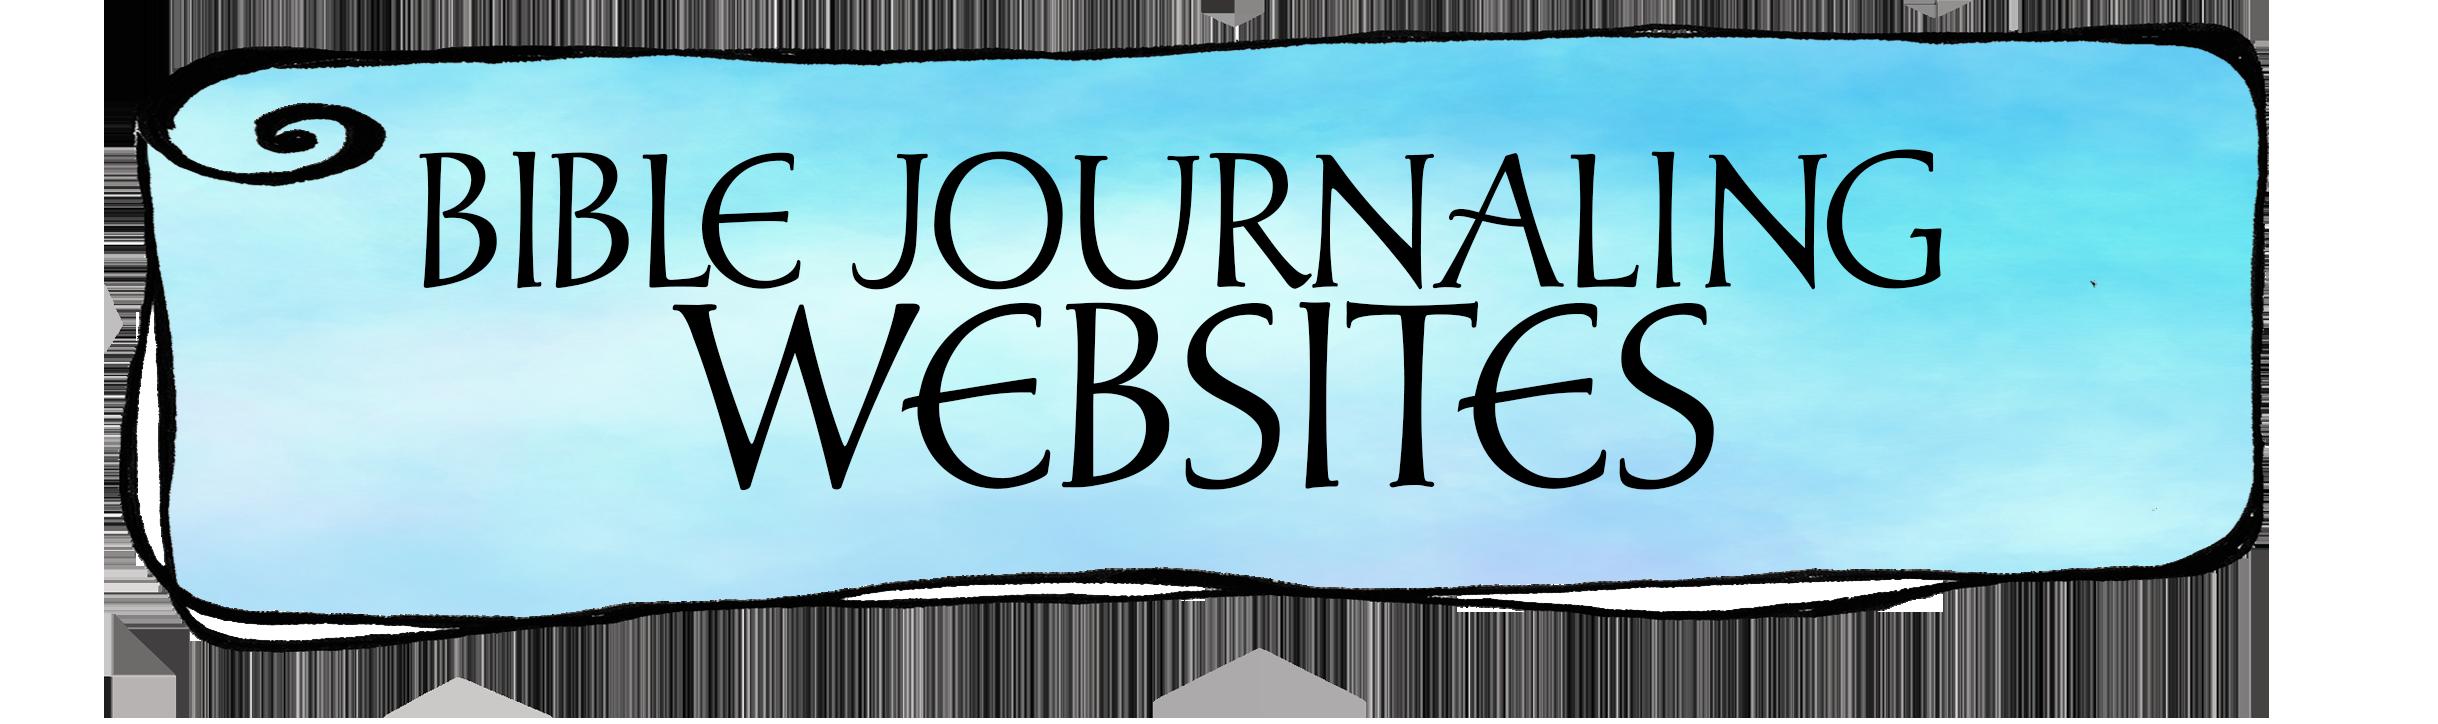 Bible Journaling Websites